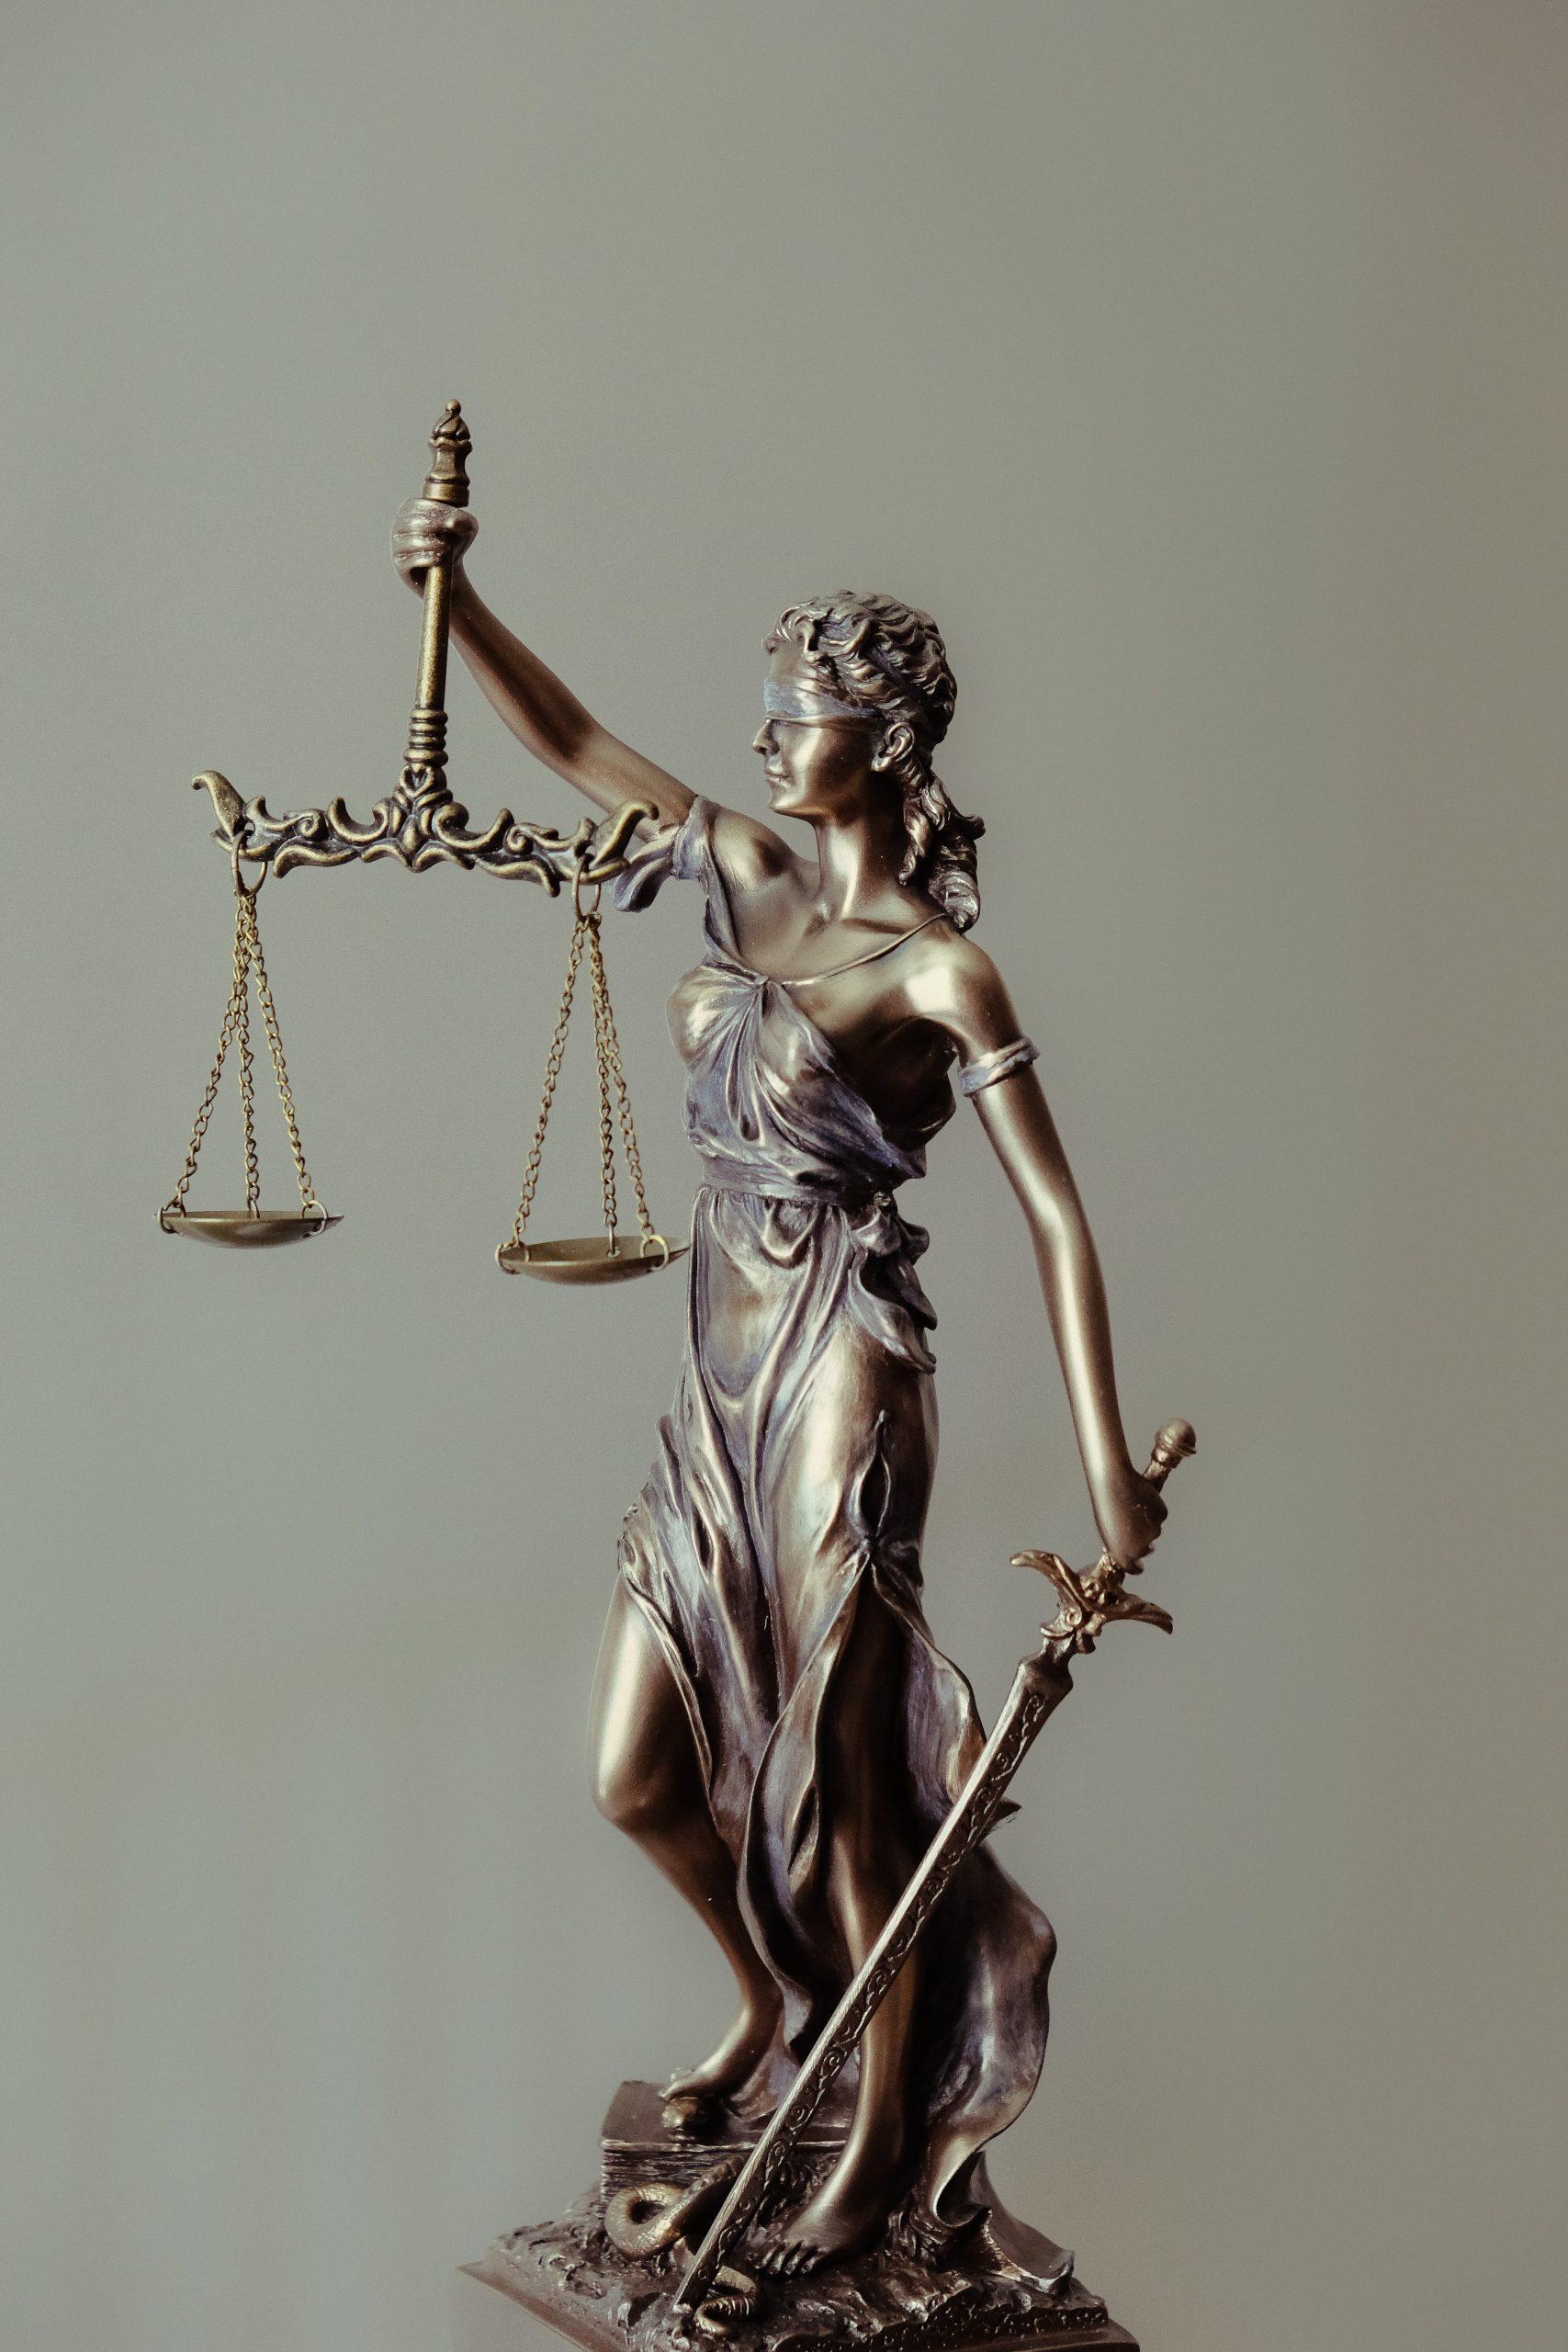 https://lisaslaw.co.uk/wp-content/uploads/2019/09/tingey-injury-law-firm-L4YGuSg0fxs-unsplash-scaled.jpg